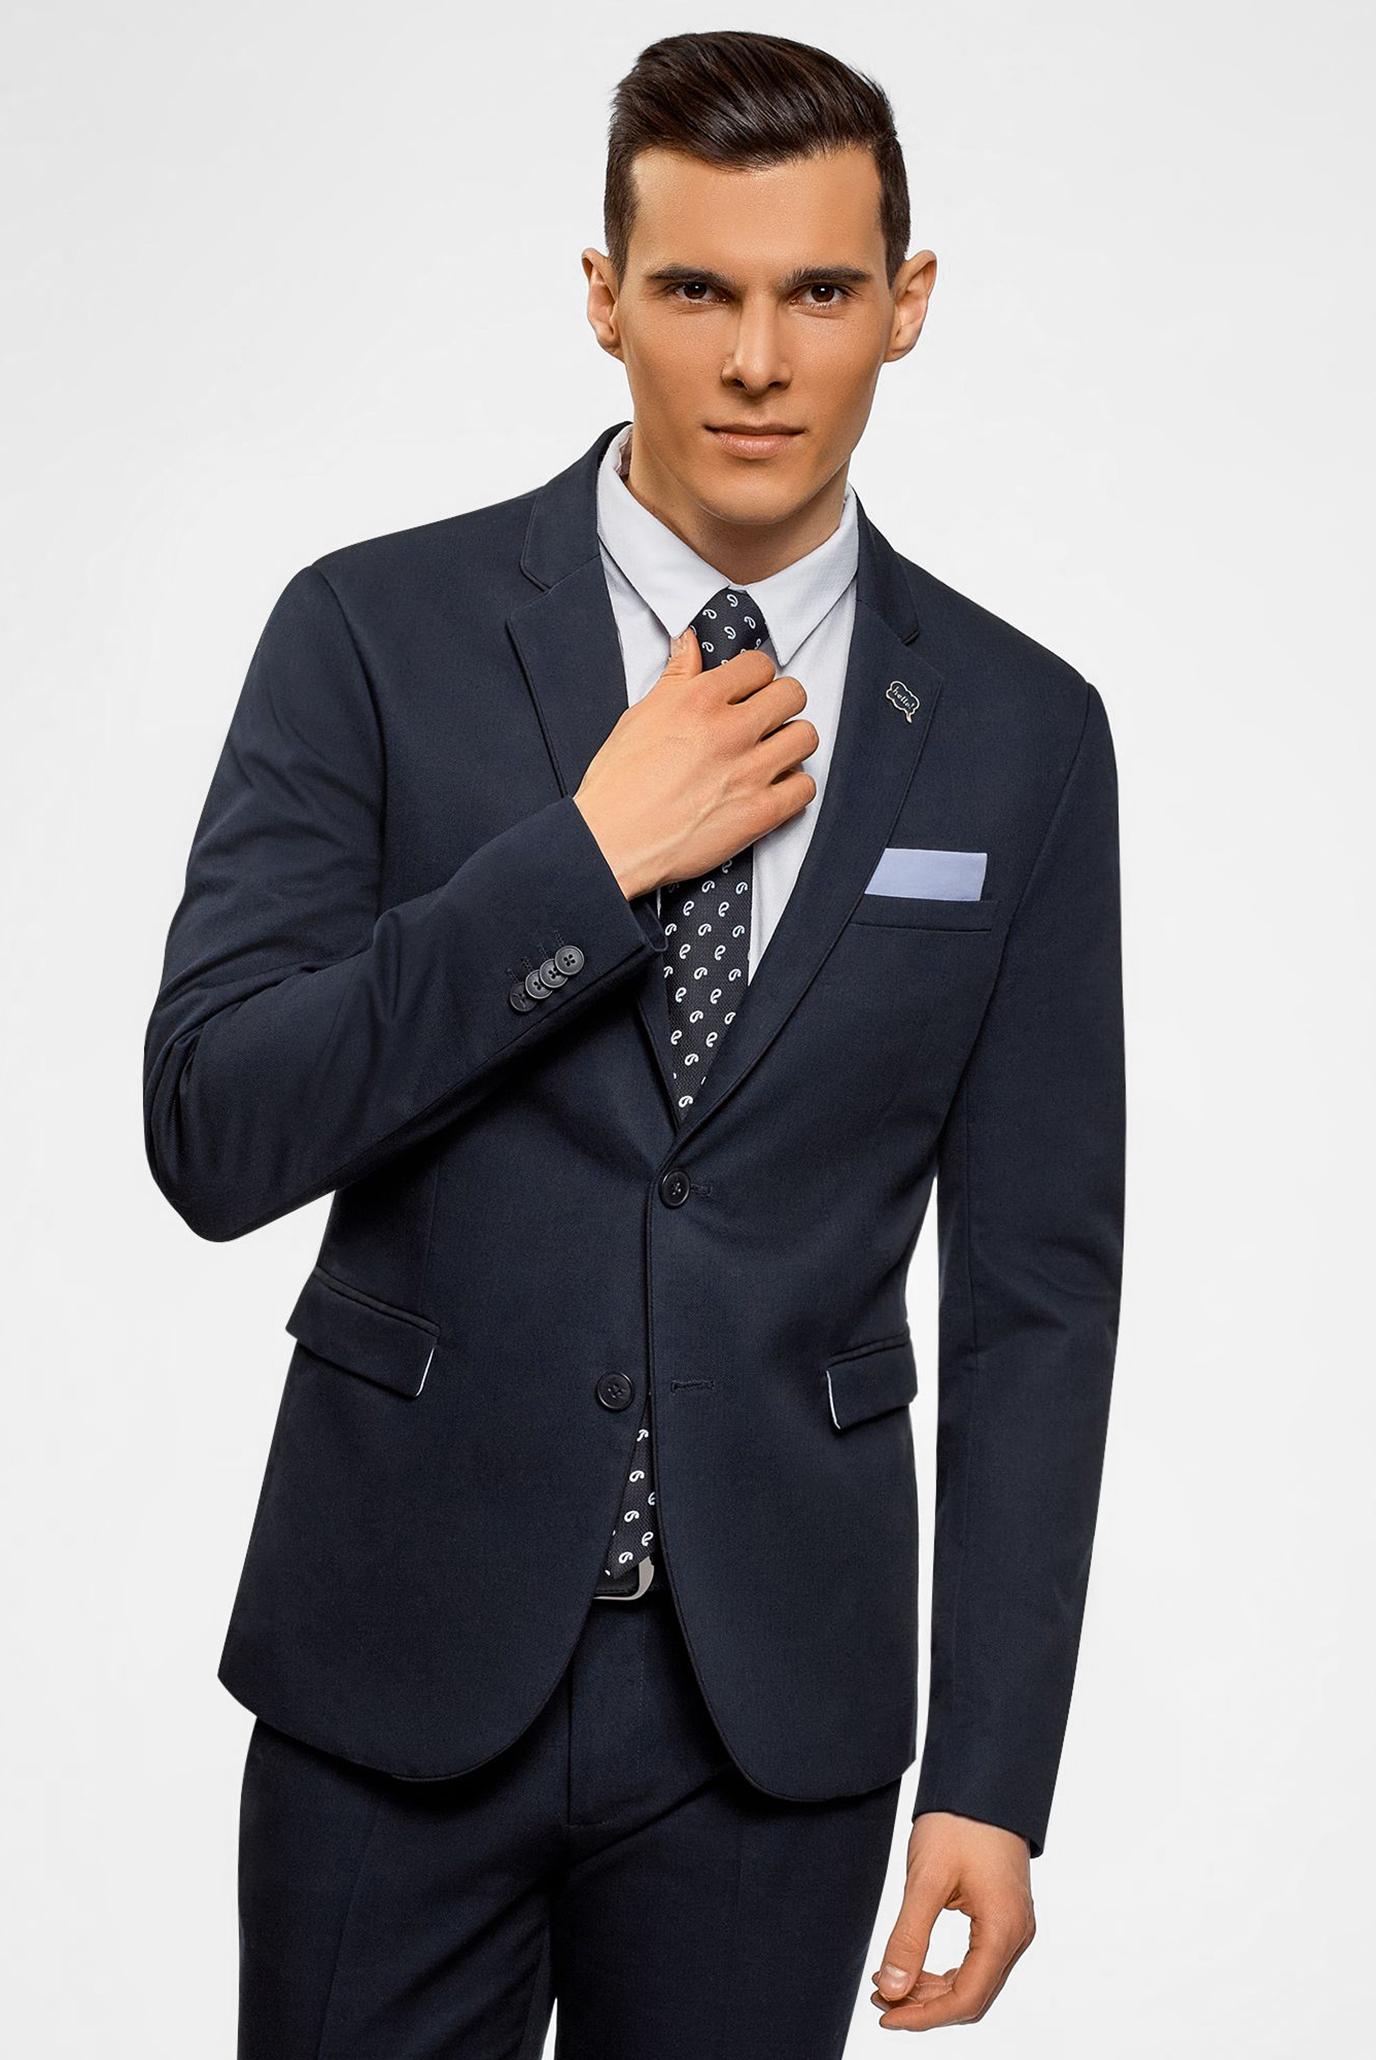 Купить Мужской темно-синий пиджак Oodji Oodji 2L420219M/48137N/7900N – Киев, Украина. Цены в интернет магазине MD Fashion